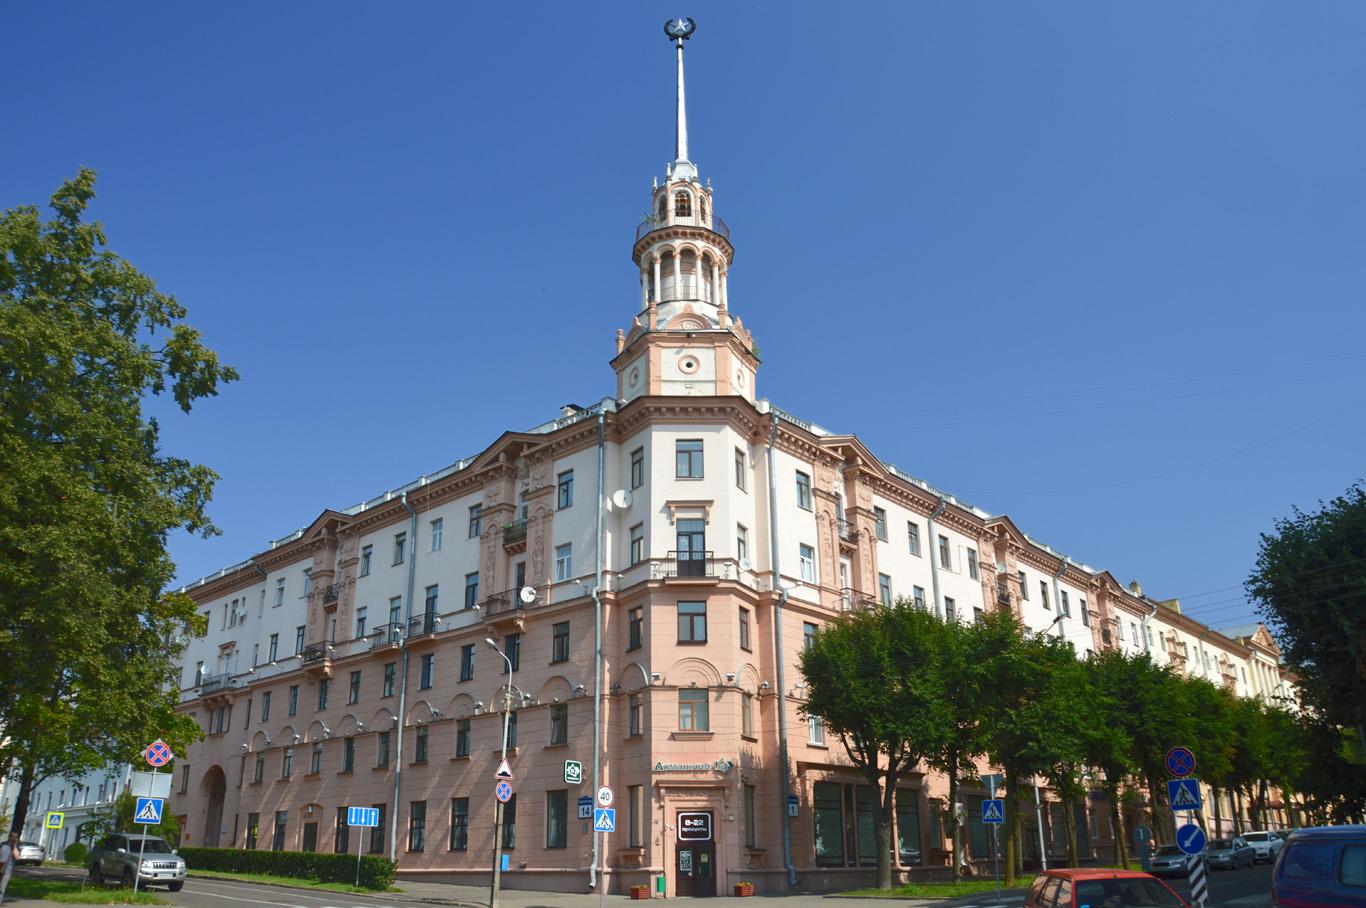 Random building in Minsk